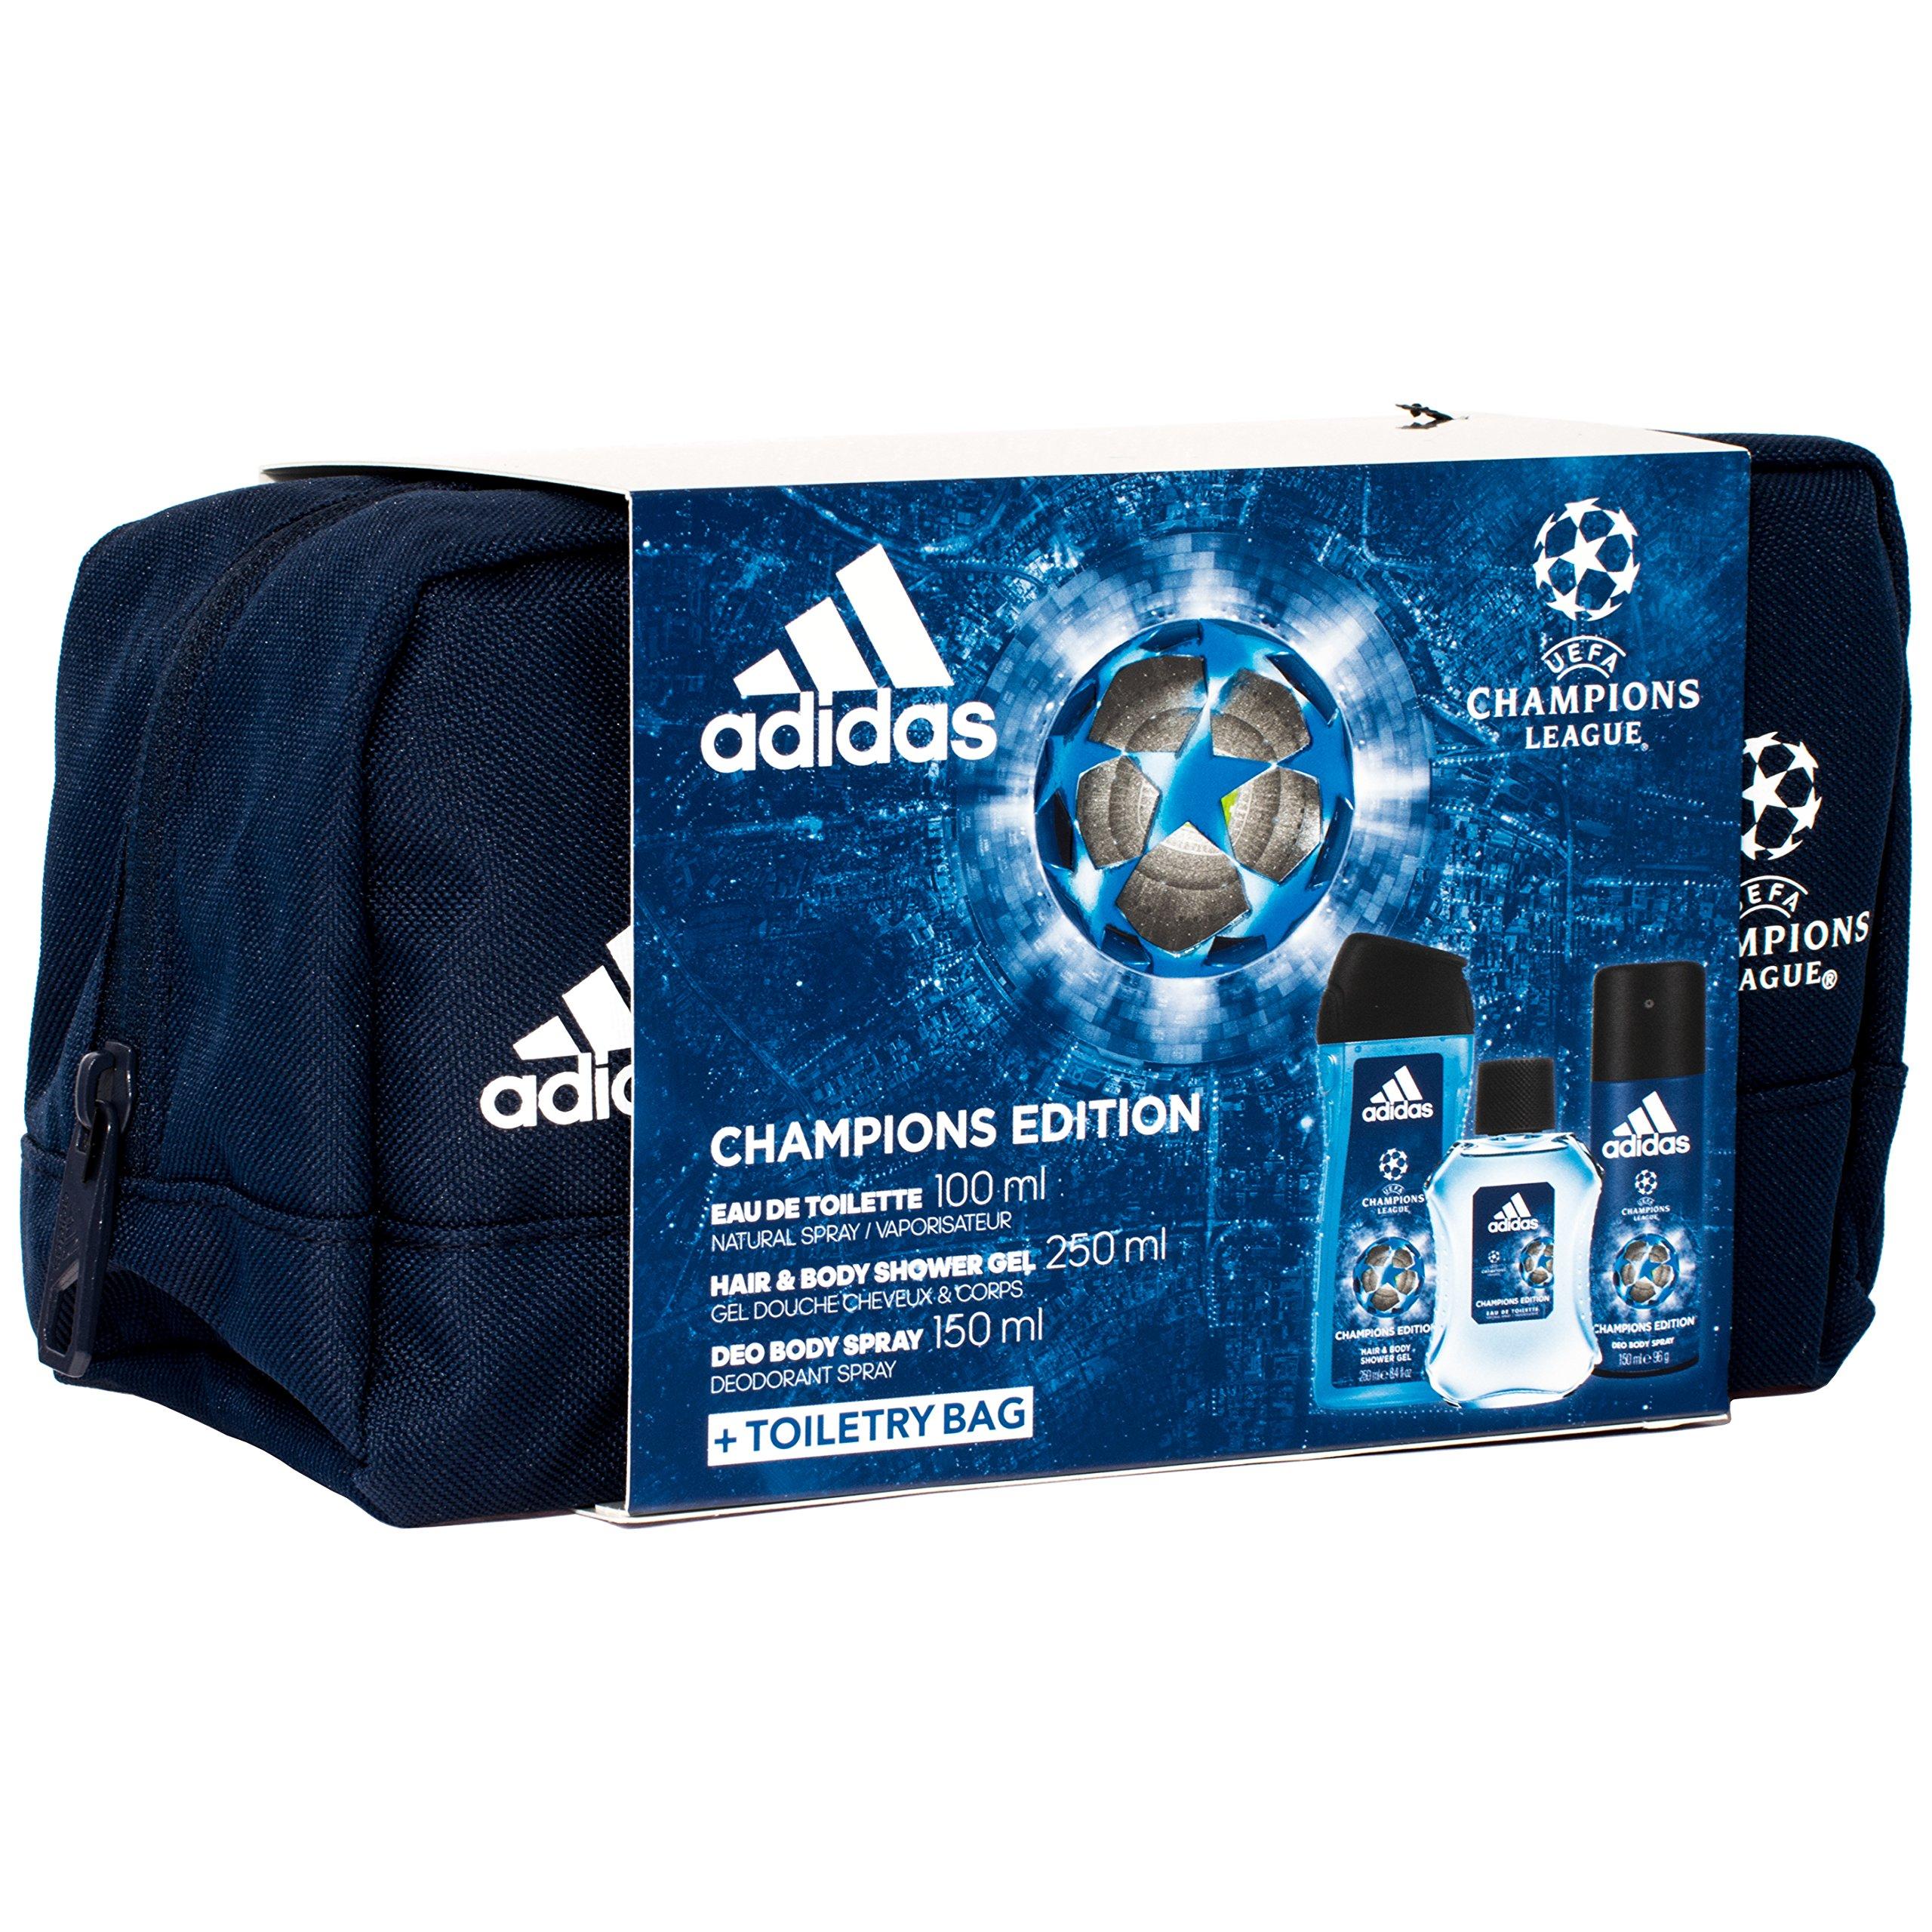 quality design 43d32 e0783 Adidas Champions League Edition Wash Bag Gift Set